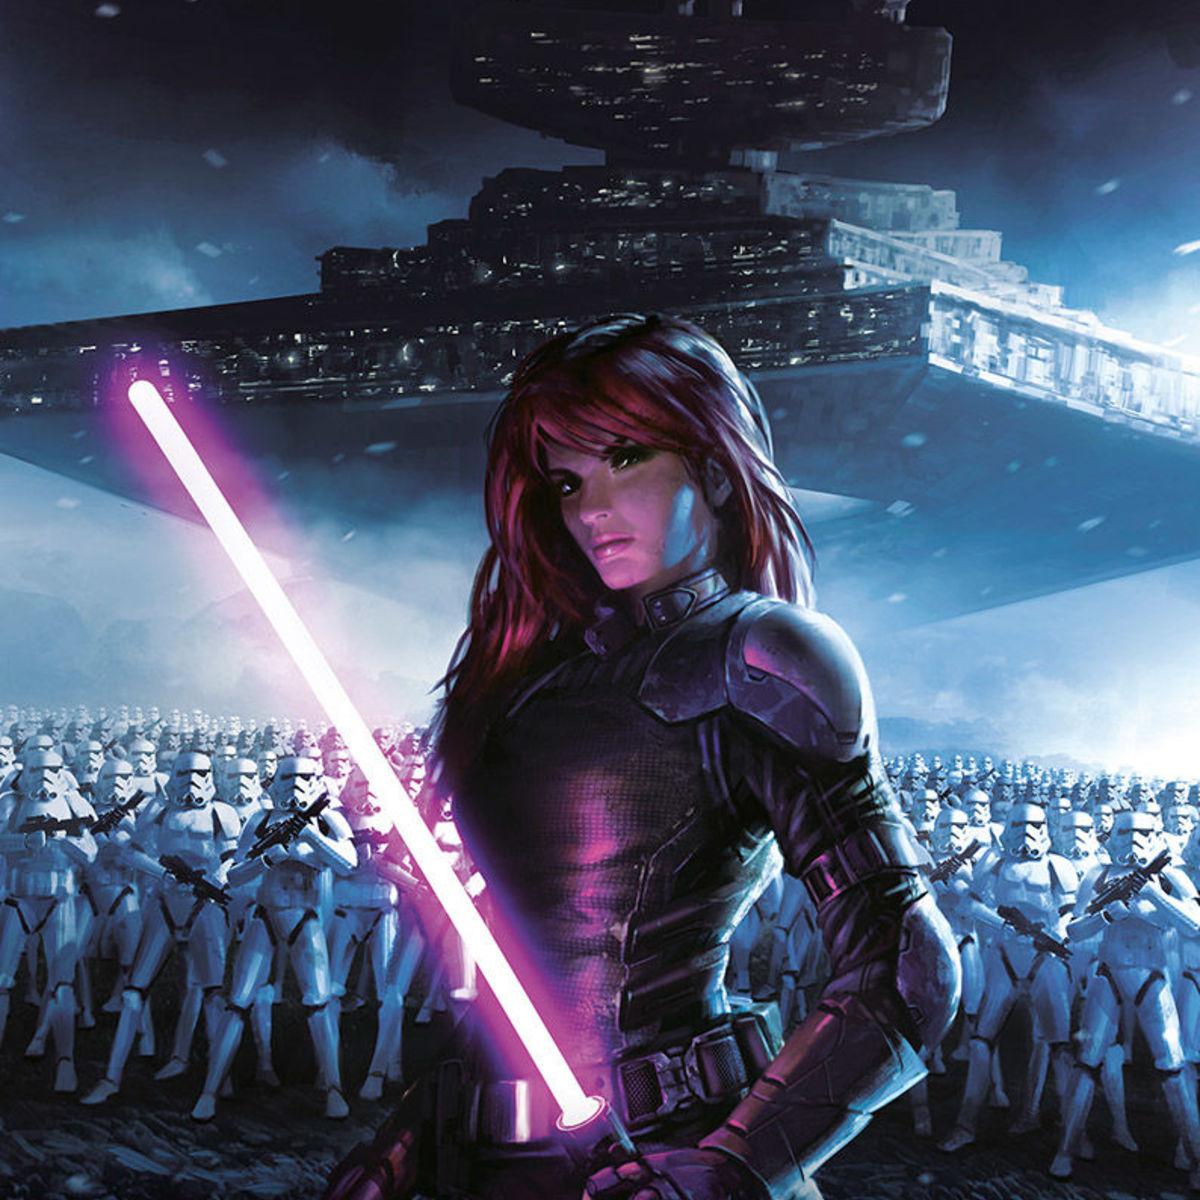 Luke Skywalker And Mara Jade Wedding